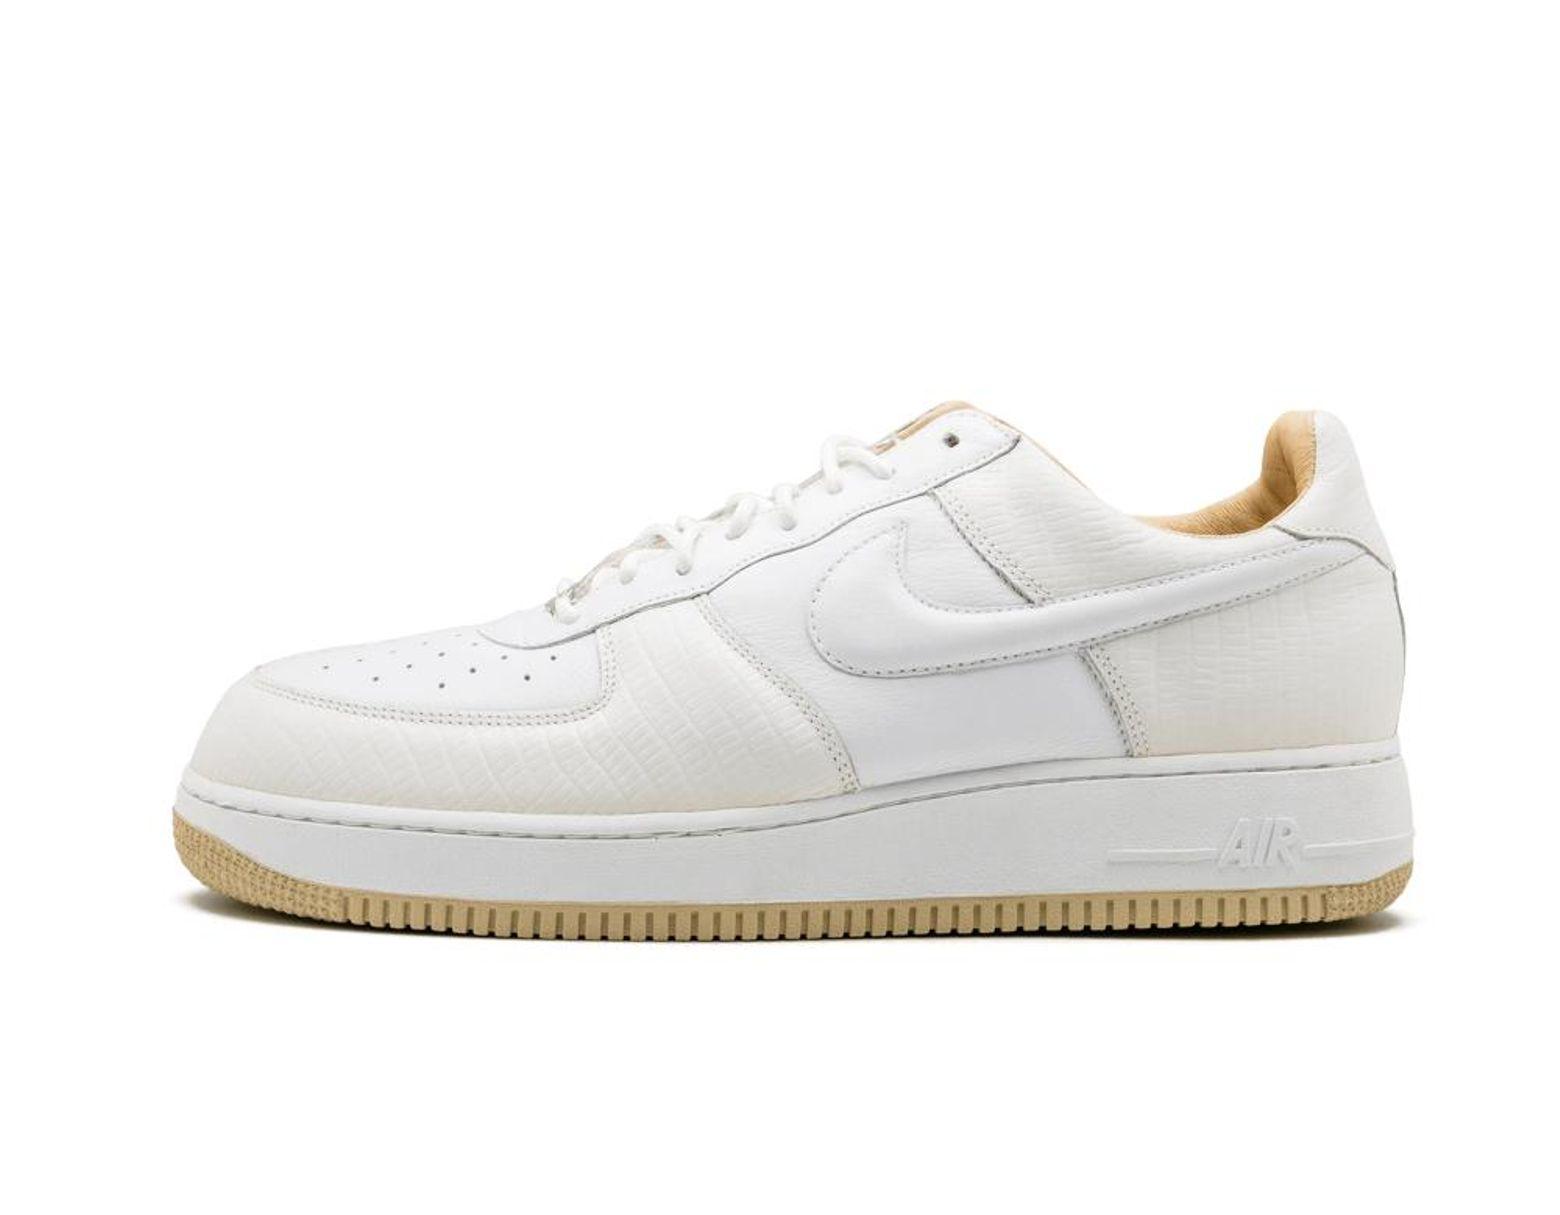 Nike Air Force 1 Lux Phantom Python Release Date Sneaker